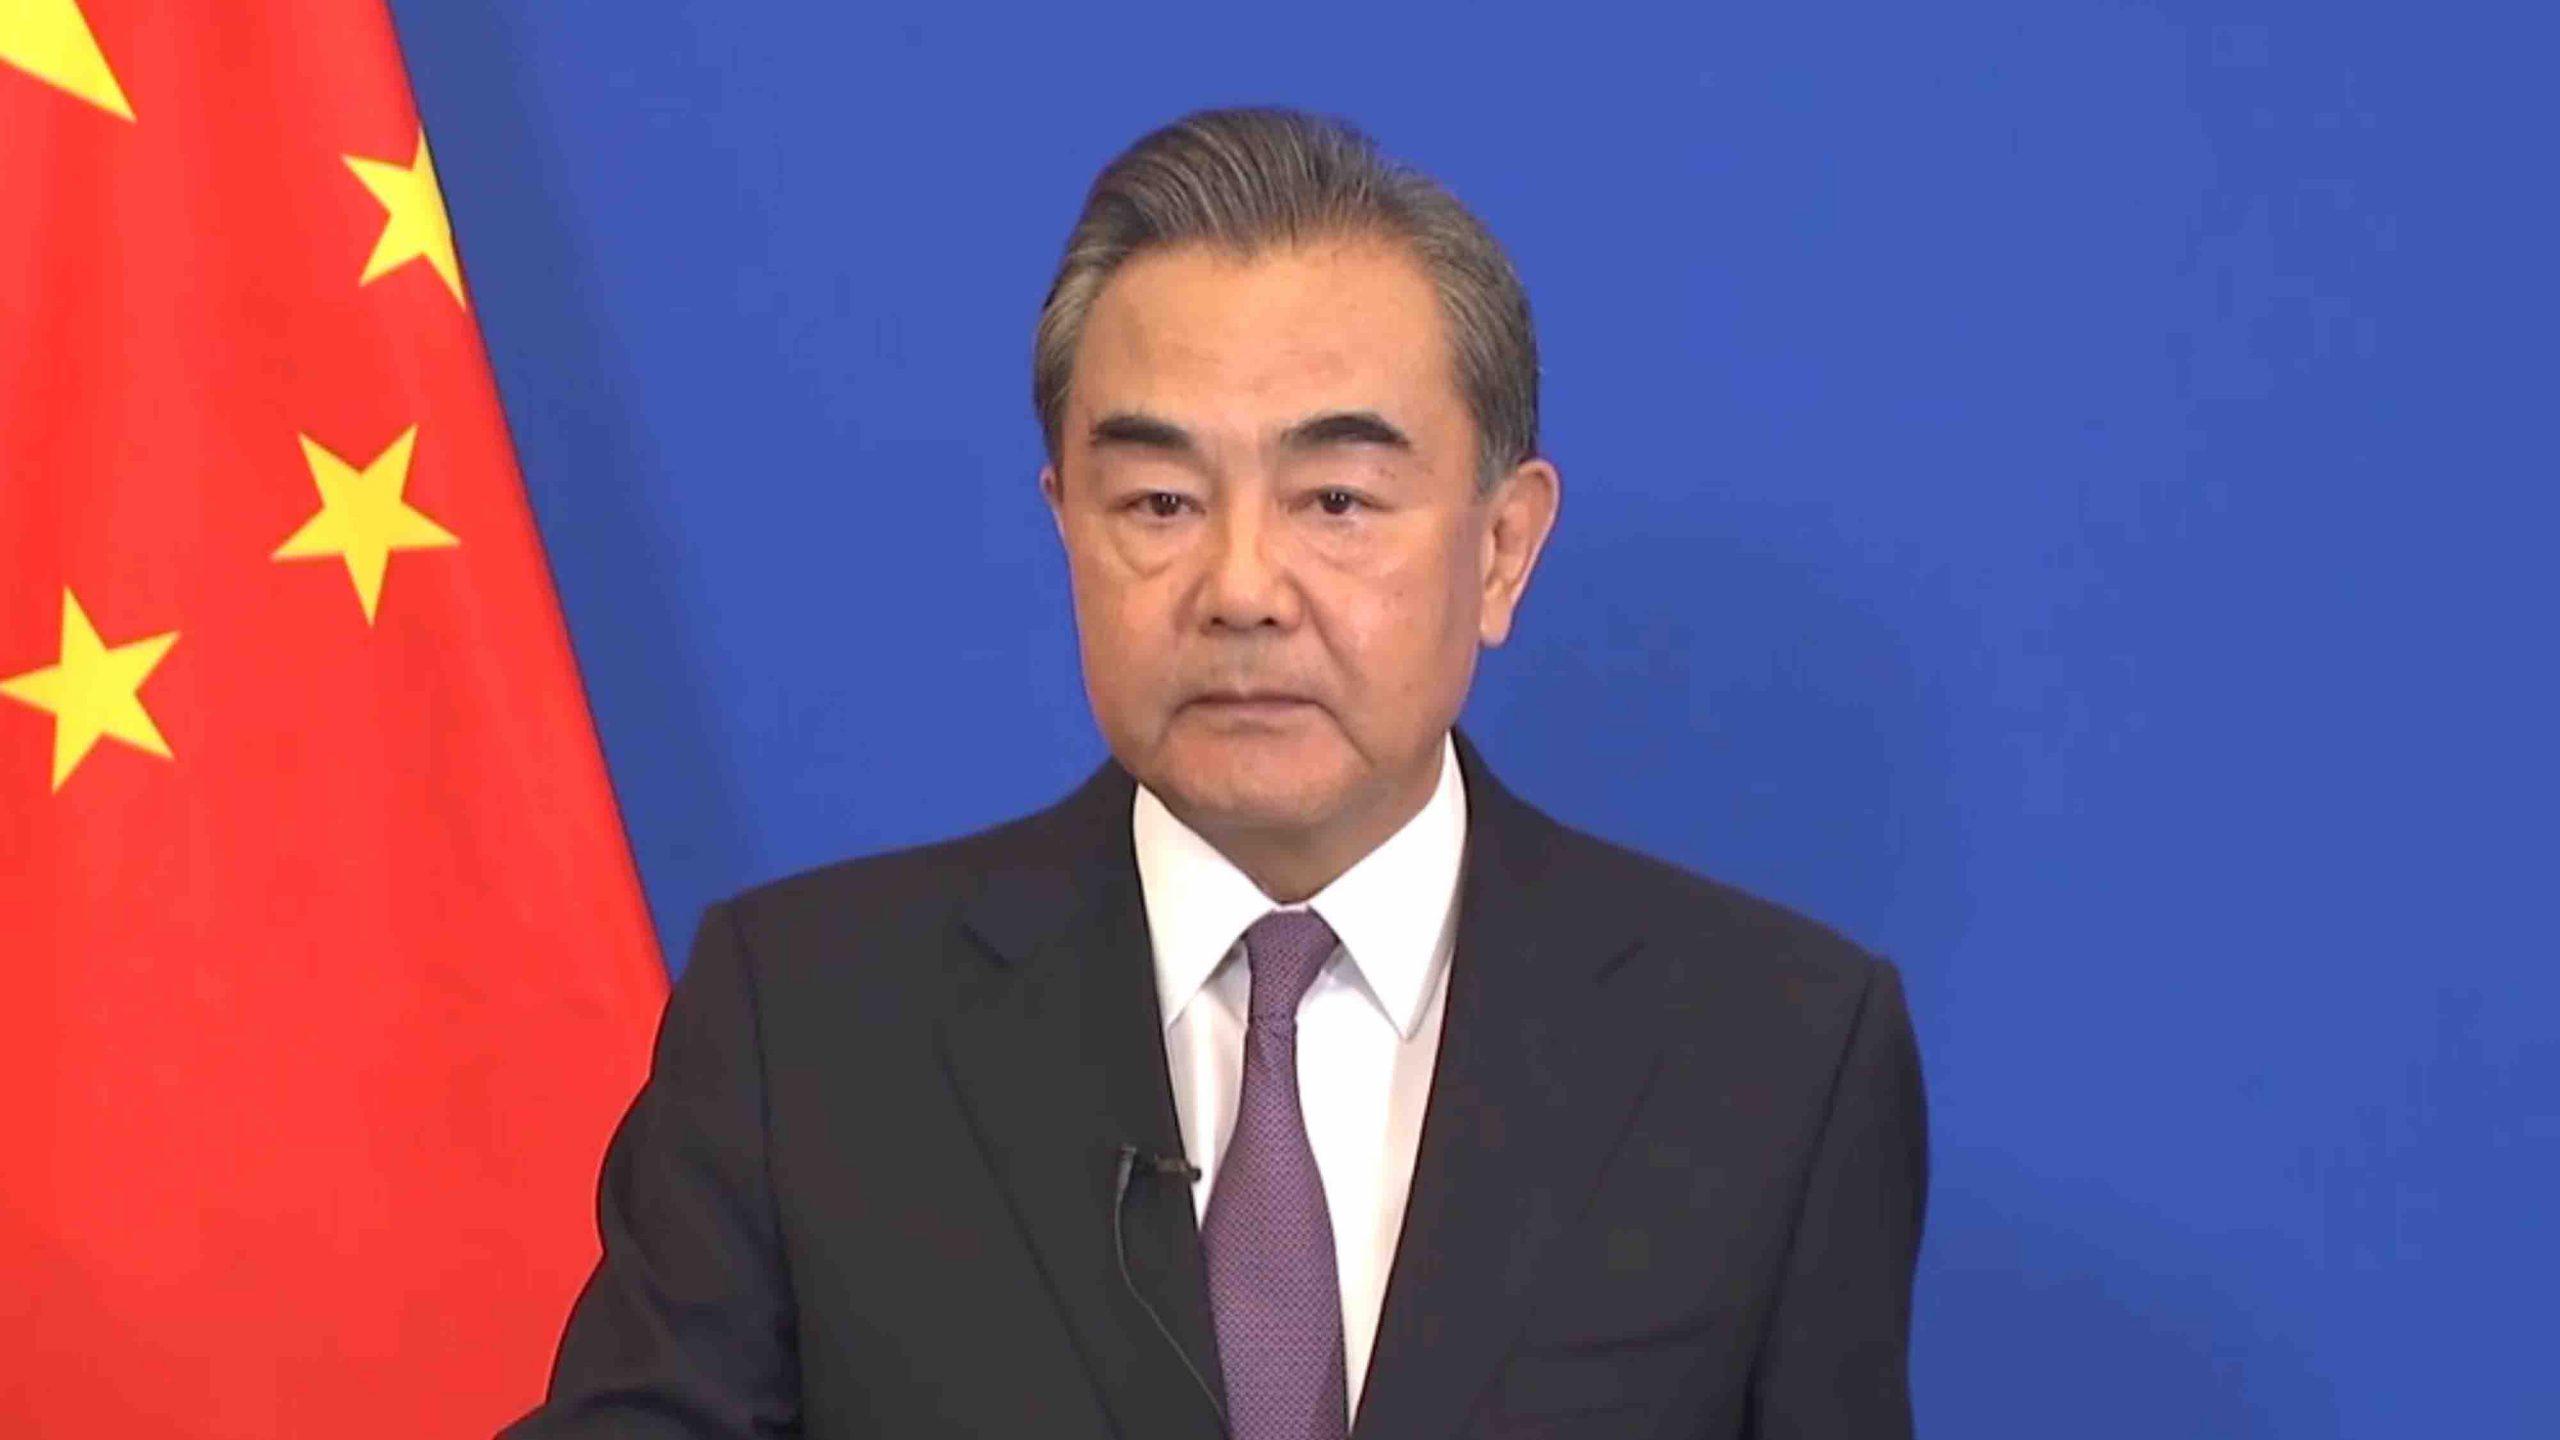 Remove tariffs on Chinese goods to repair relations, China tells US